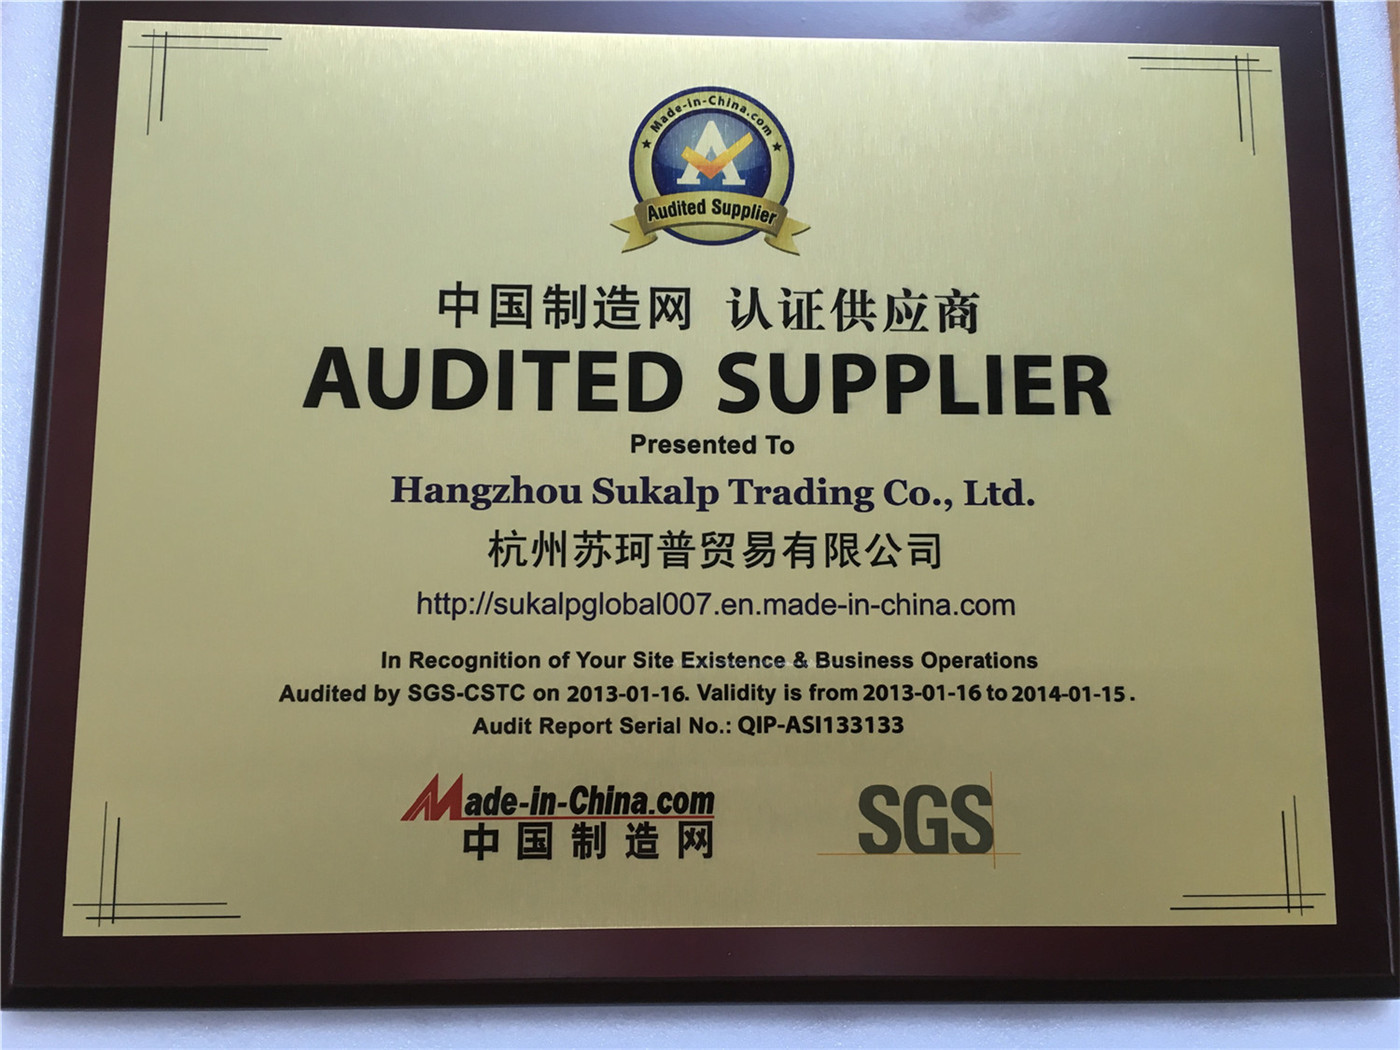 HangZhou Sukalp Trading Co., Ltd